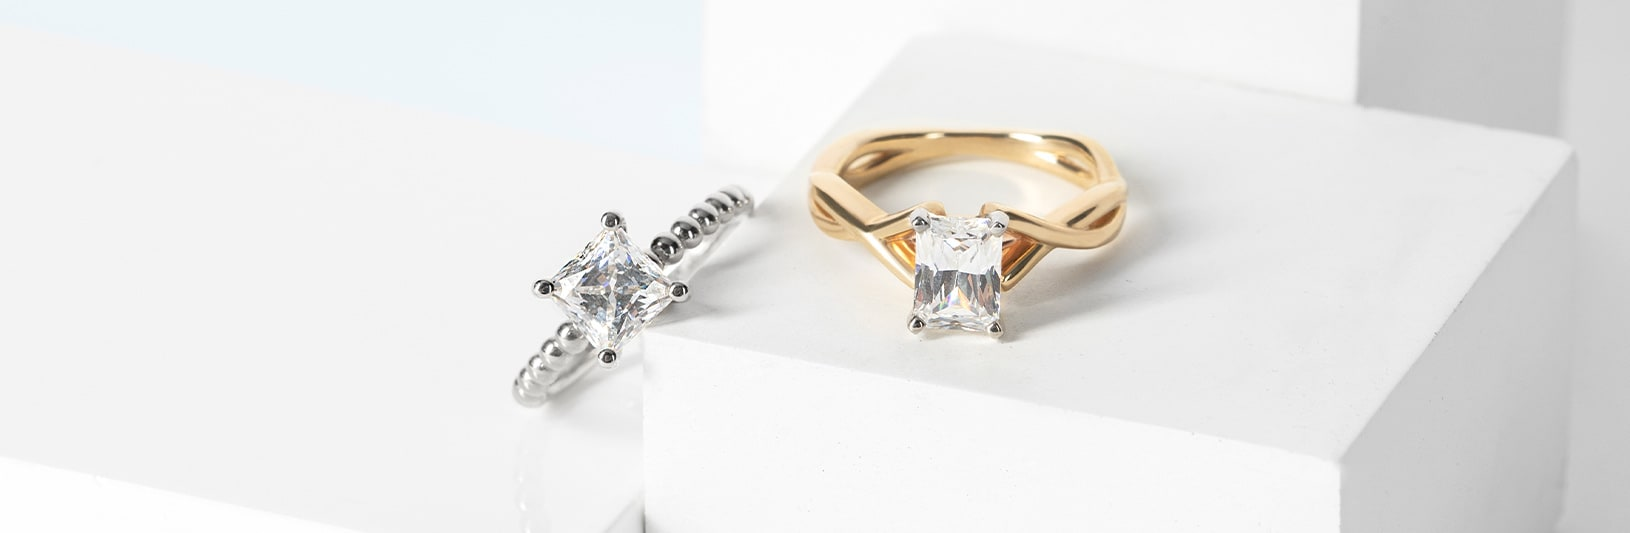 A princess cut stone compared to an emerald cut stone